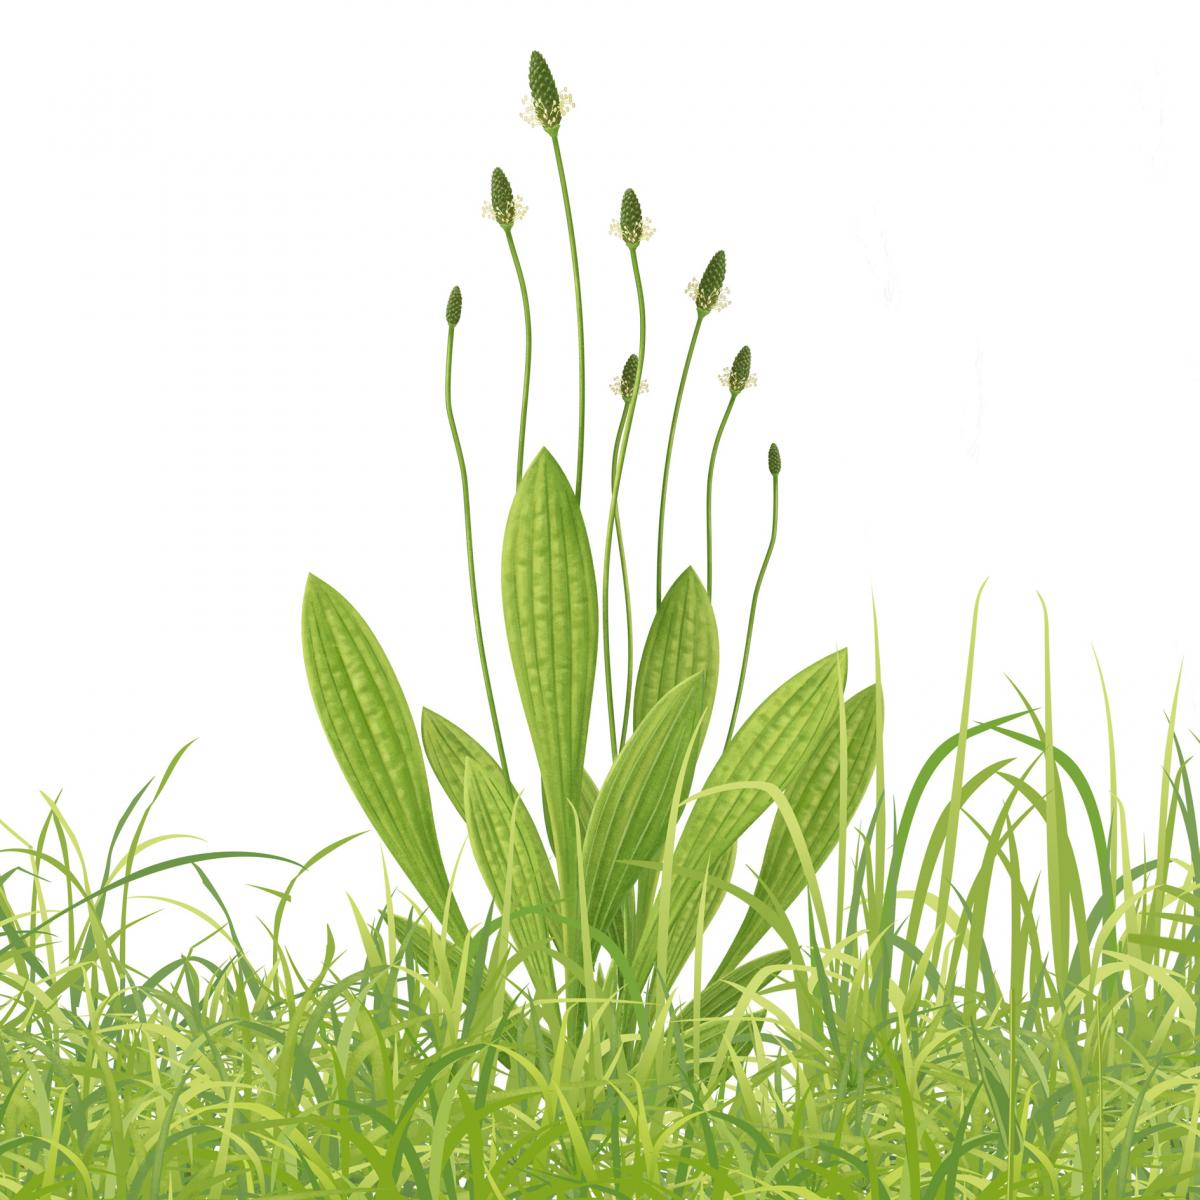 129e34acaad Smalle weegbree (Plantago lanceolata) overzichtstekening.